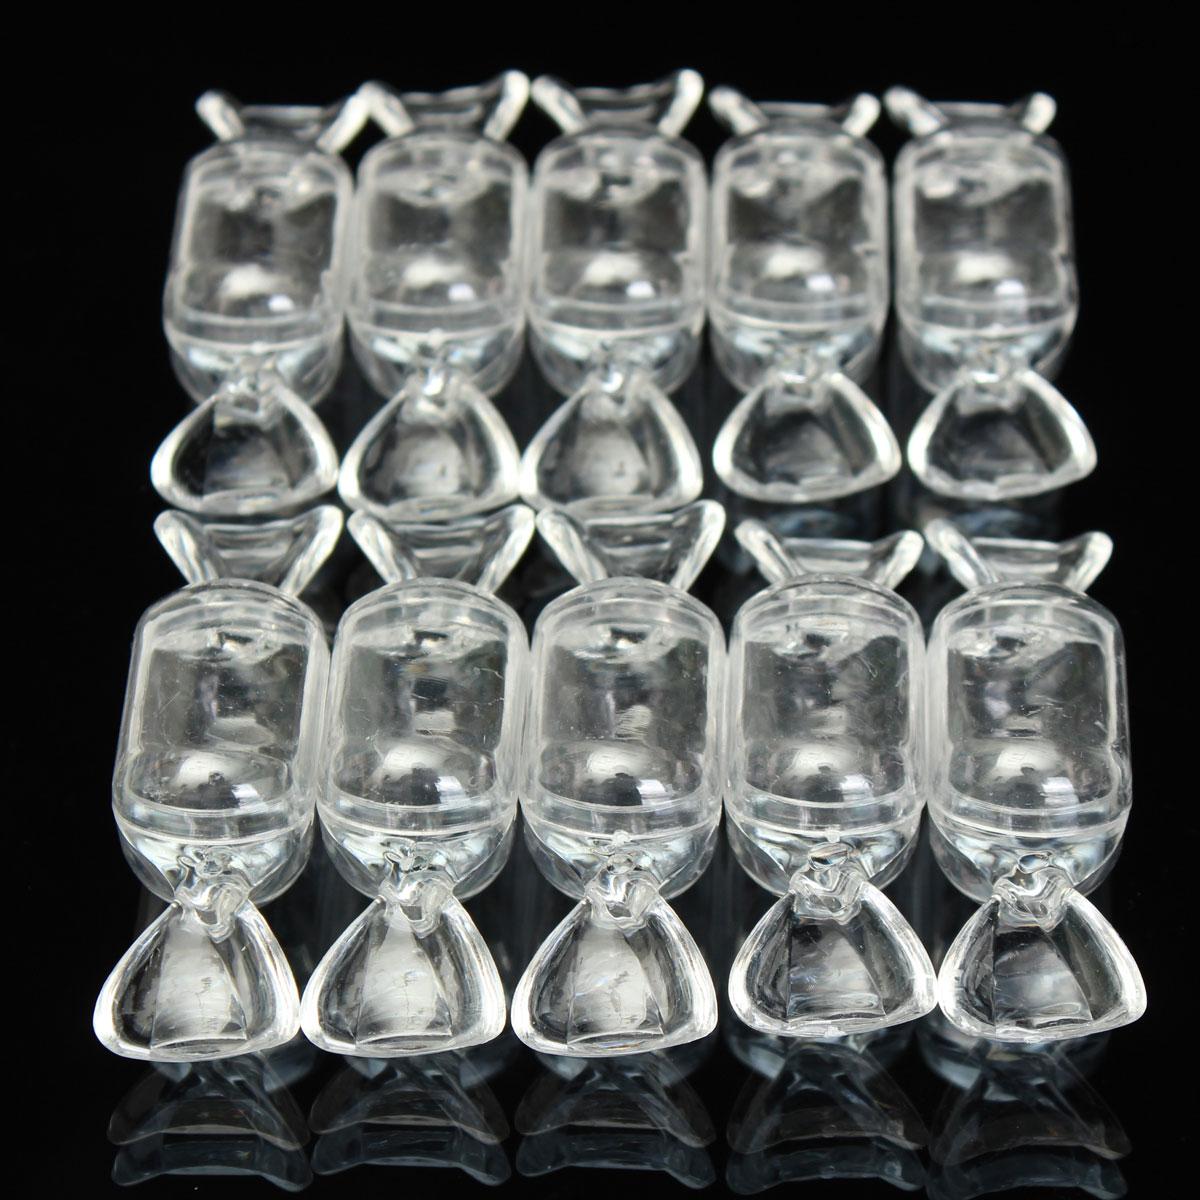 10 Pcs Transparent White Plastic Candy Boxes Wedding Favors Sweets ...